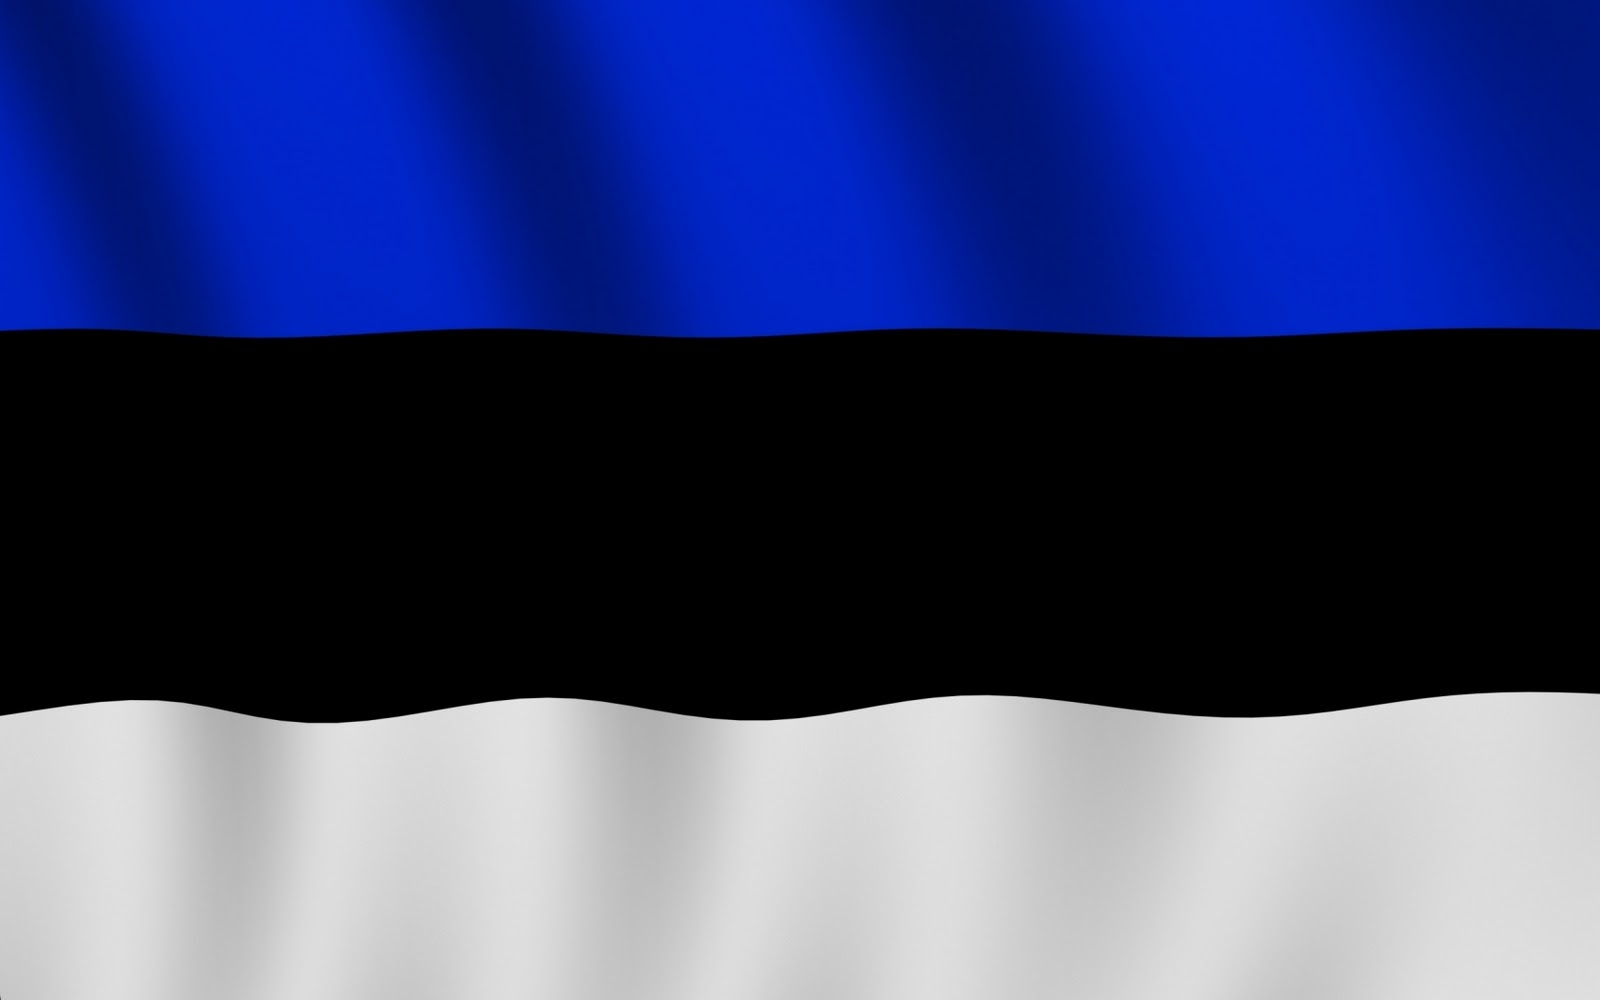 Albania Wallpaper Hd Estonia Flag Pictures